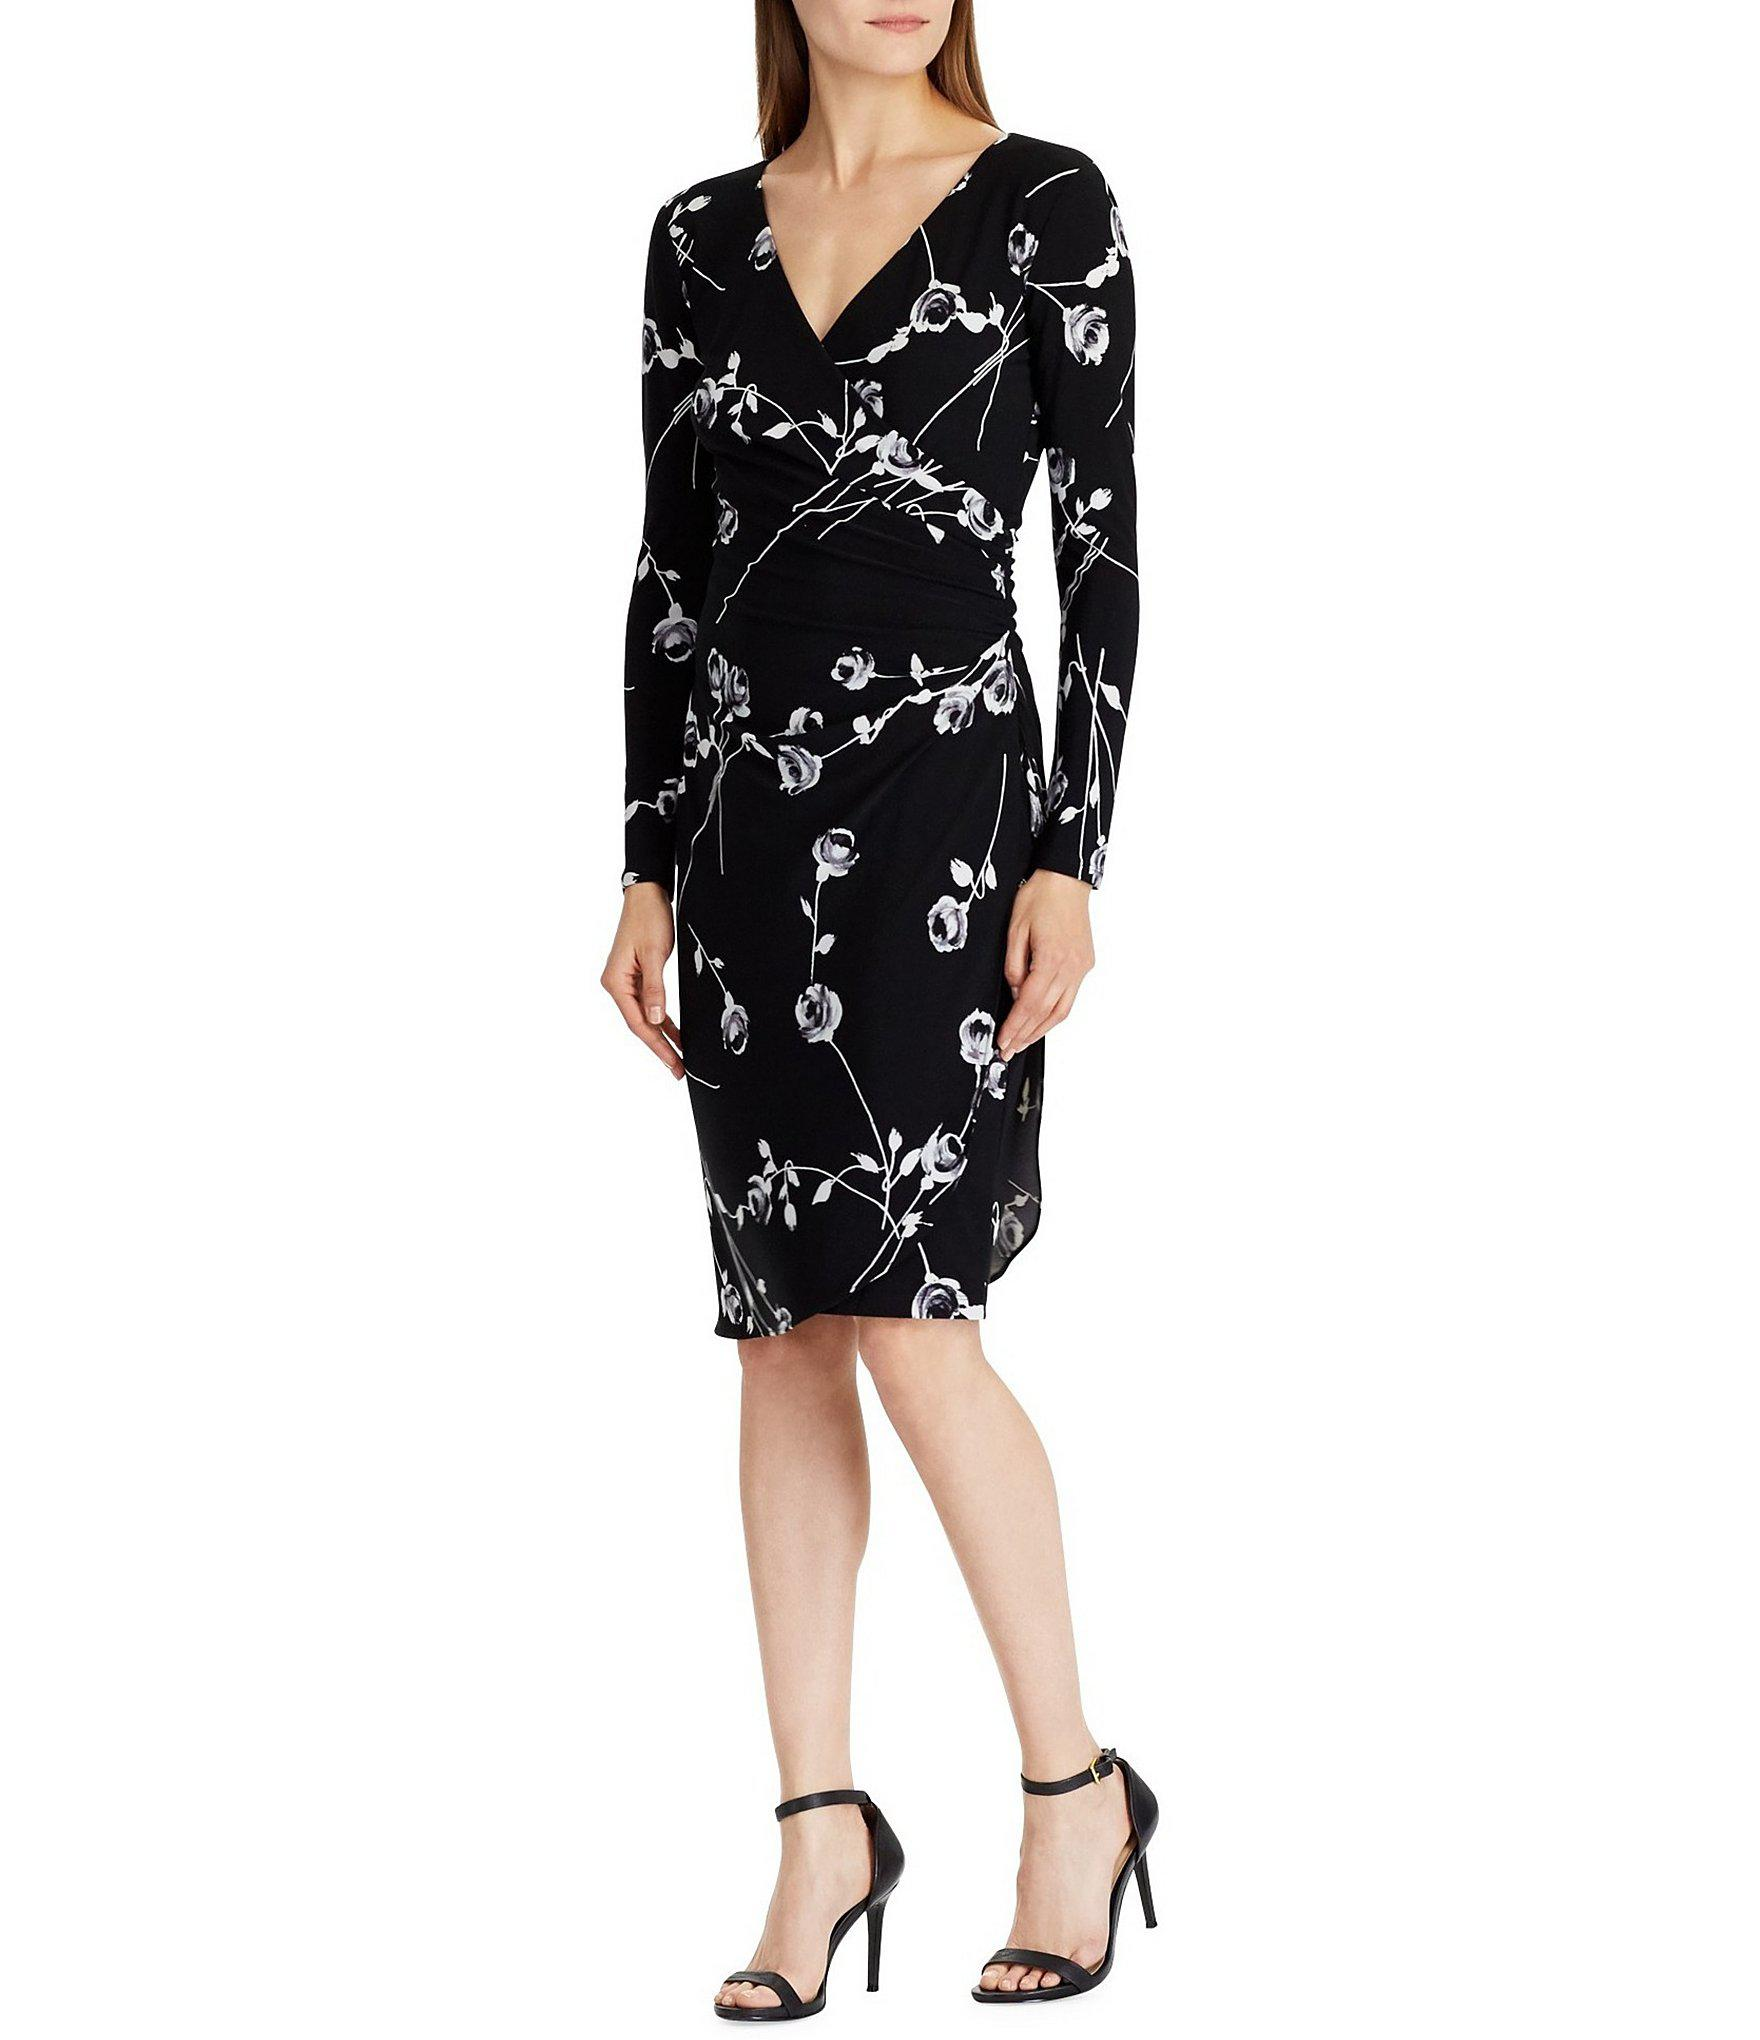 e0244d83332 Lyst - Lauren by Ralph Lauren Floral Print Surplice Neckline Jersey ...